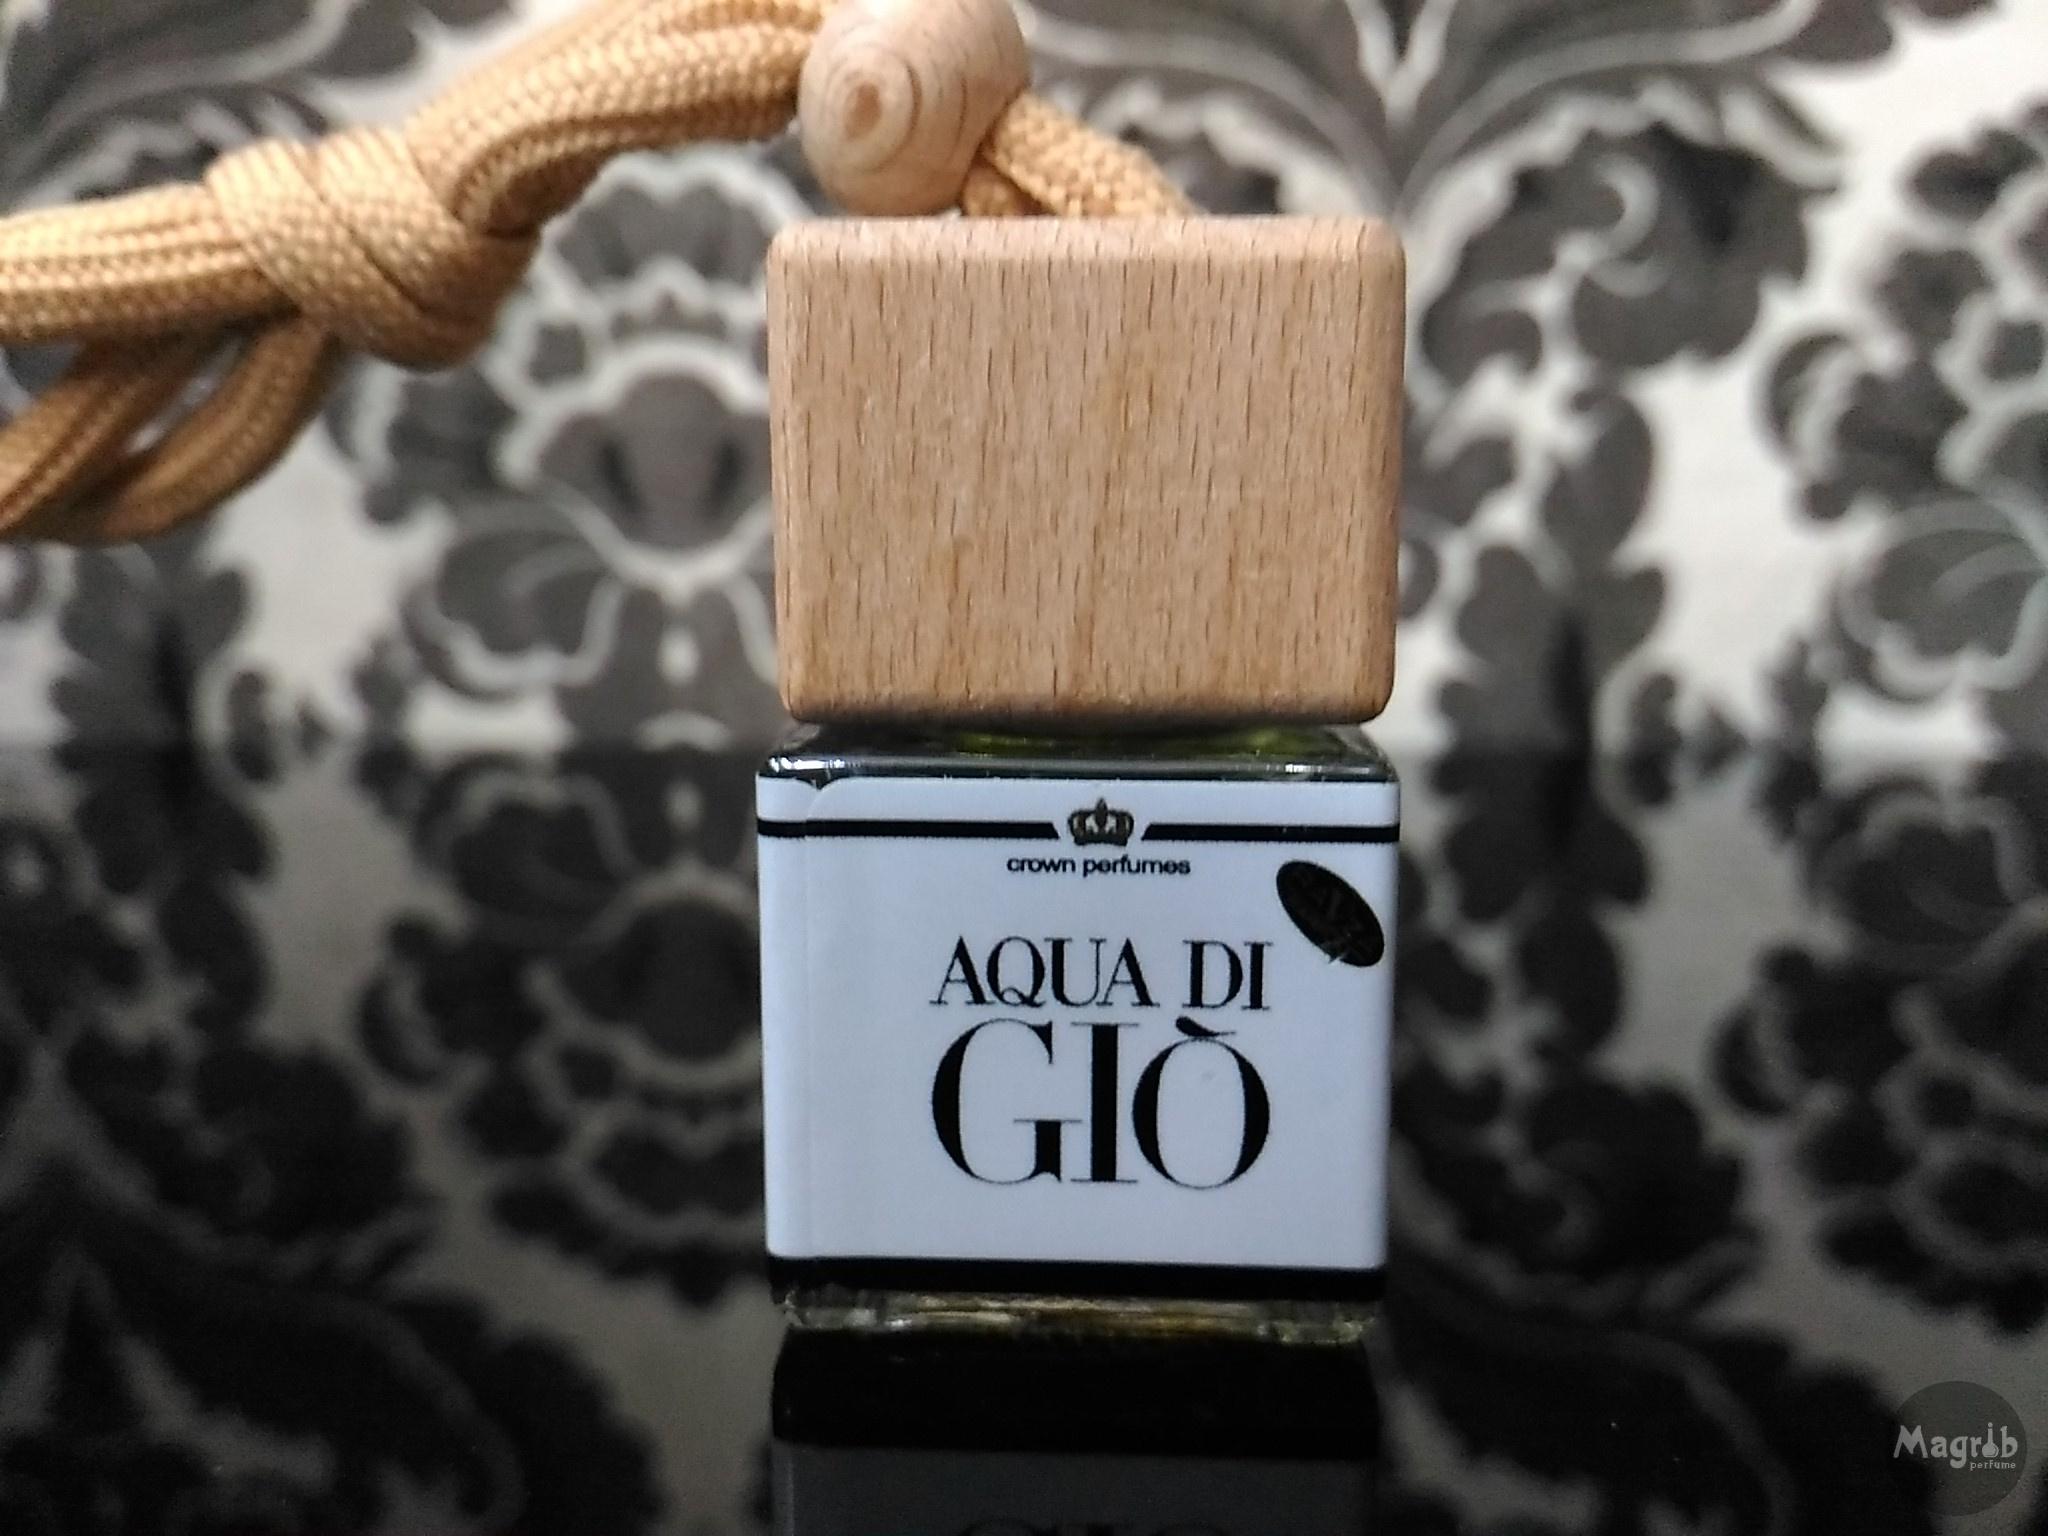 Ravza Aqua di gio 8мл - автопарфюм